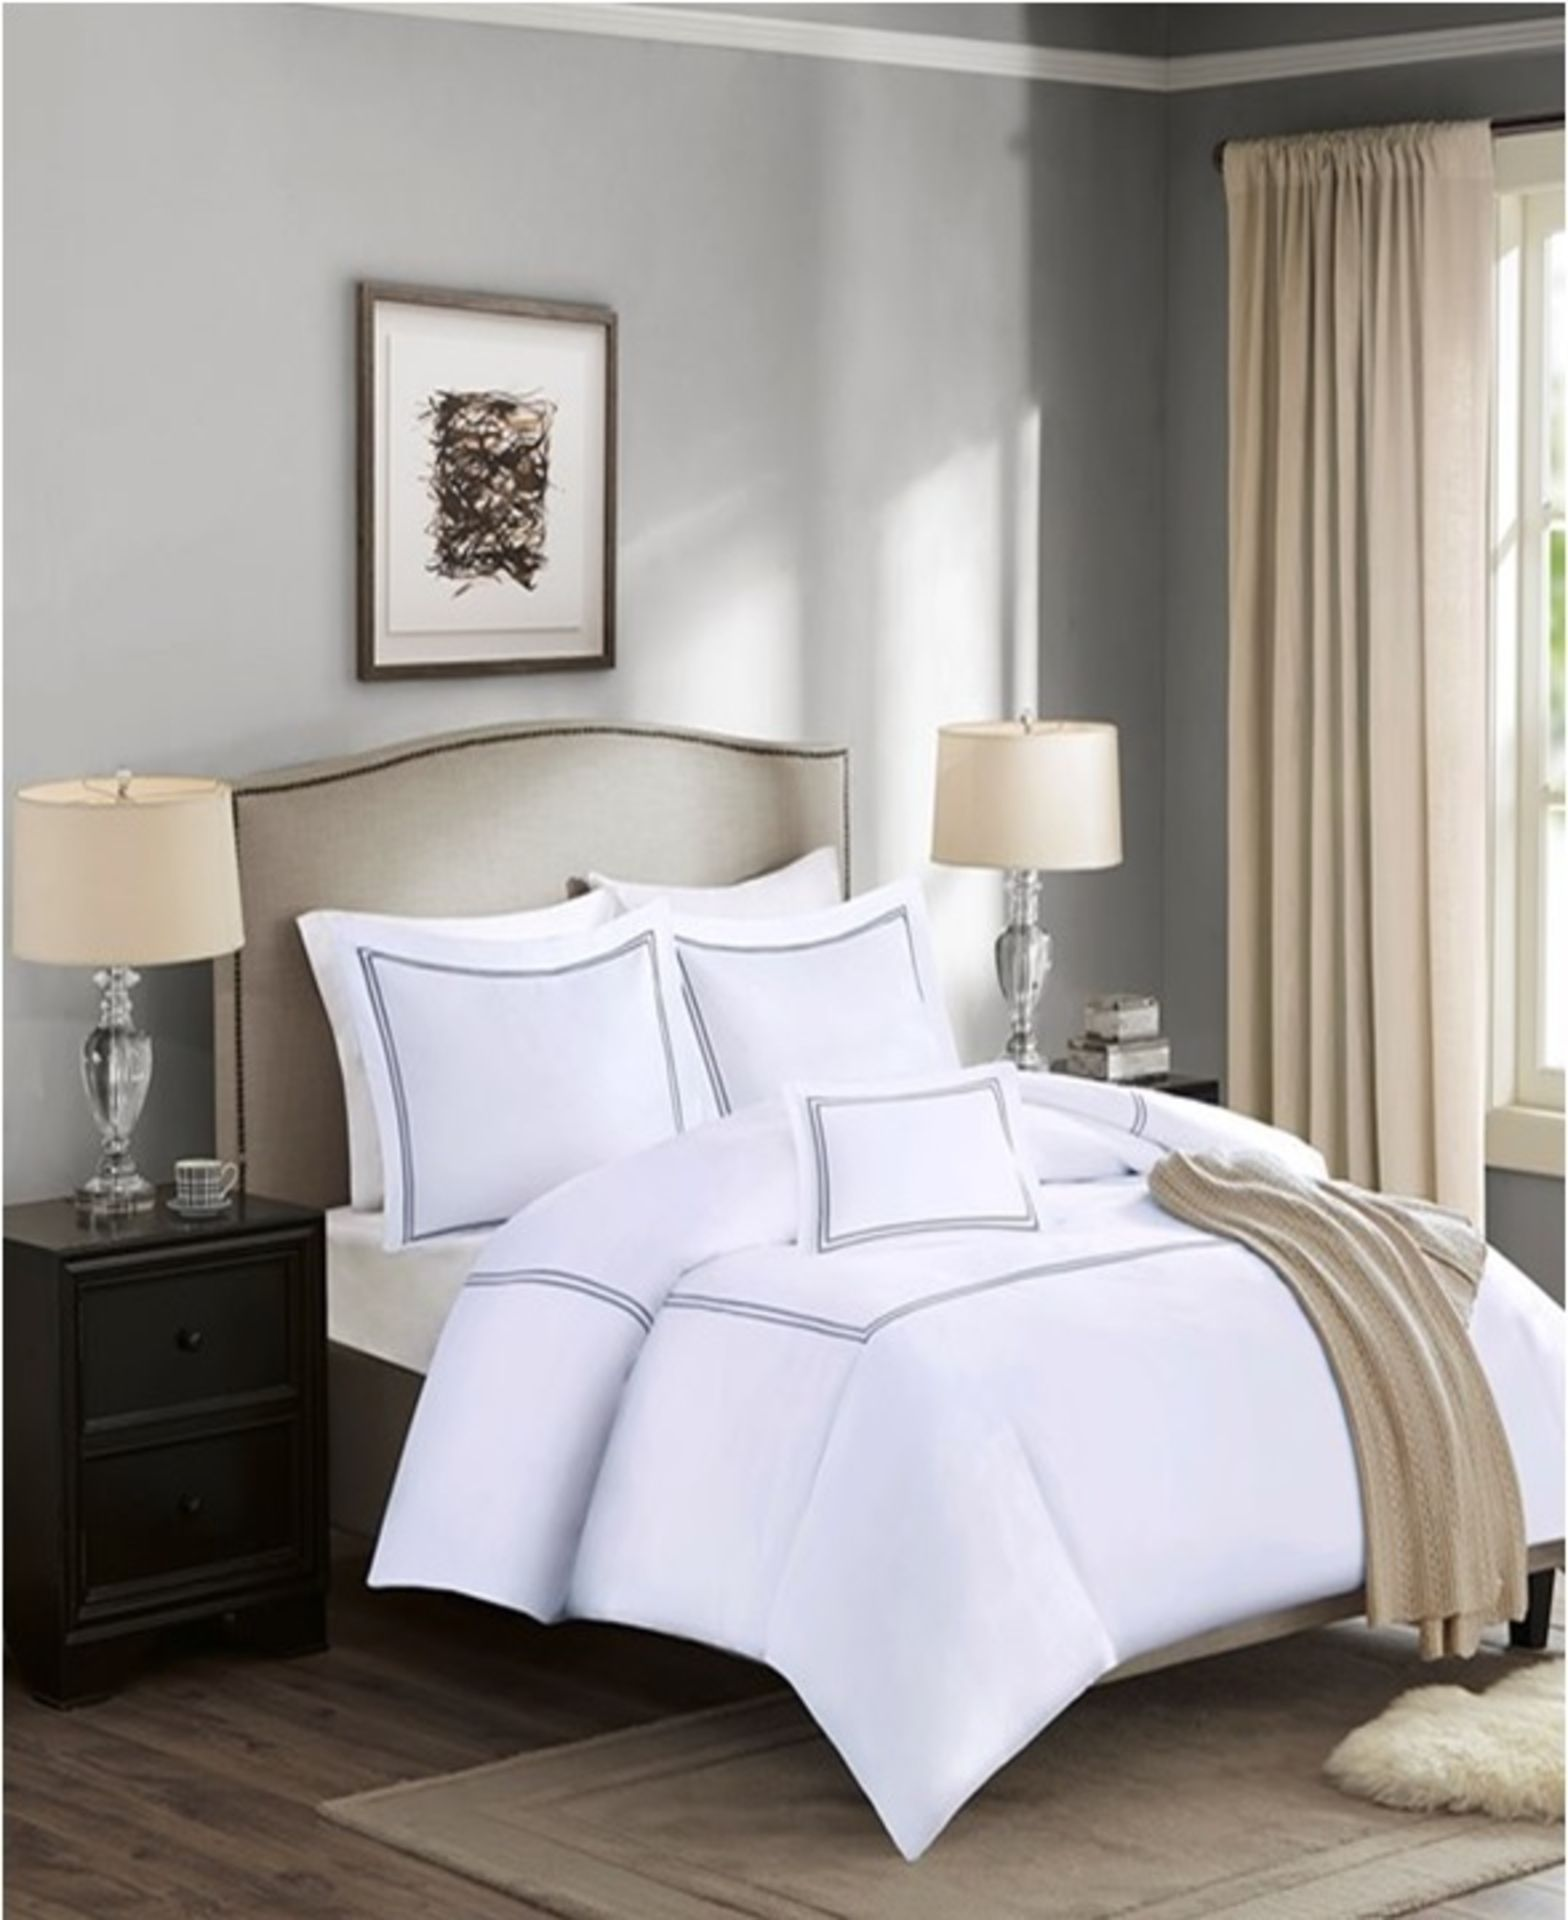 Lot 141 - 1 x Madison Park Luxury Collection Single Duvet Set White - Product Code MP12-0197UK (Brand New -